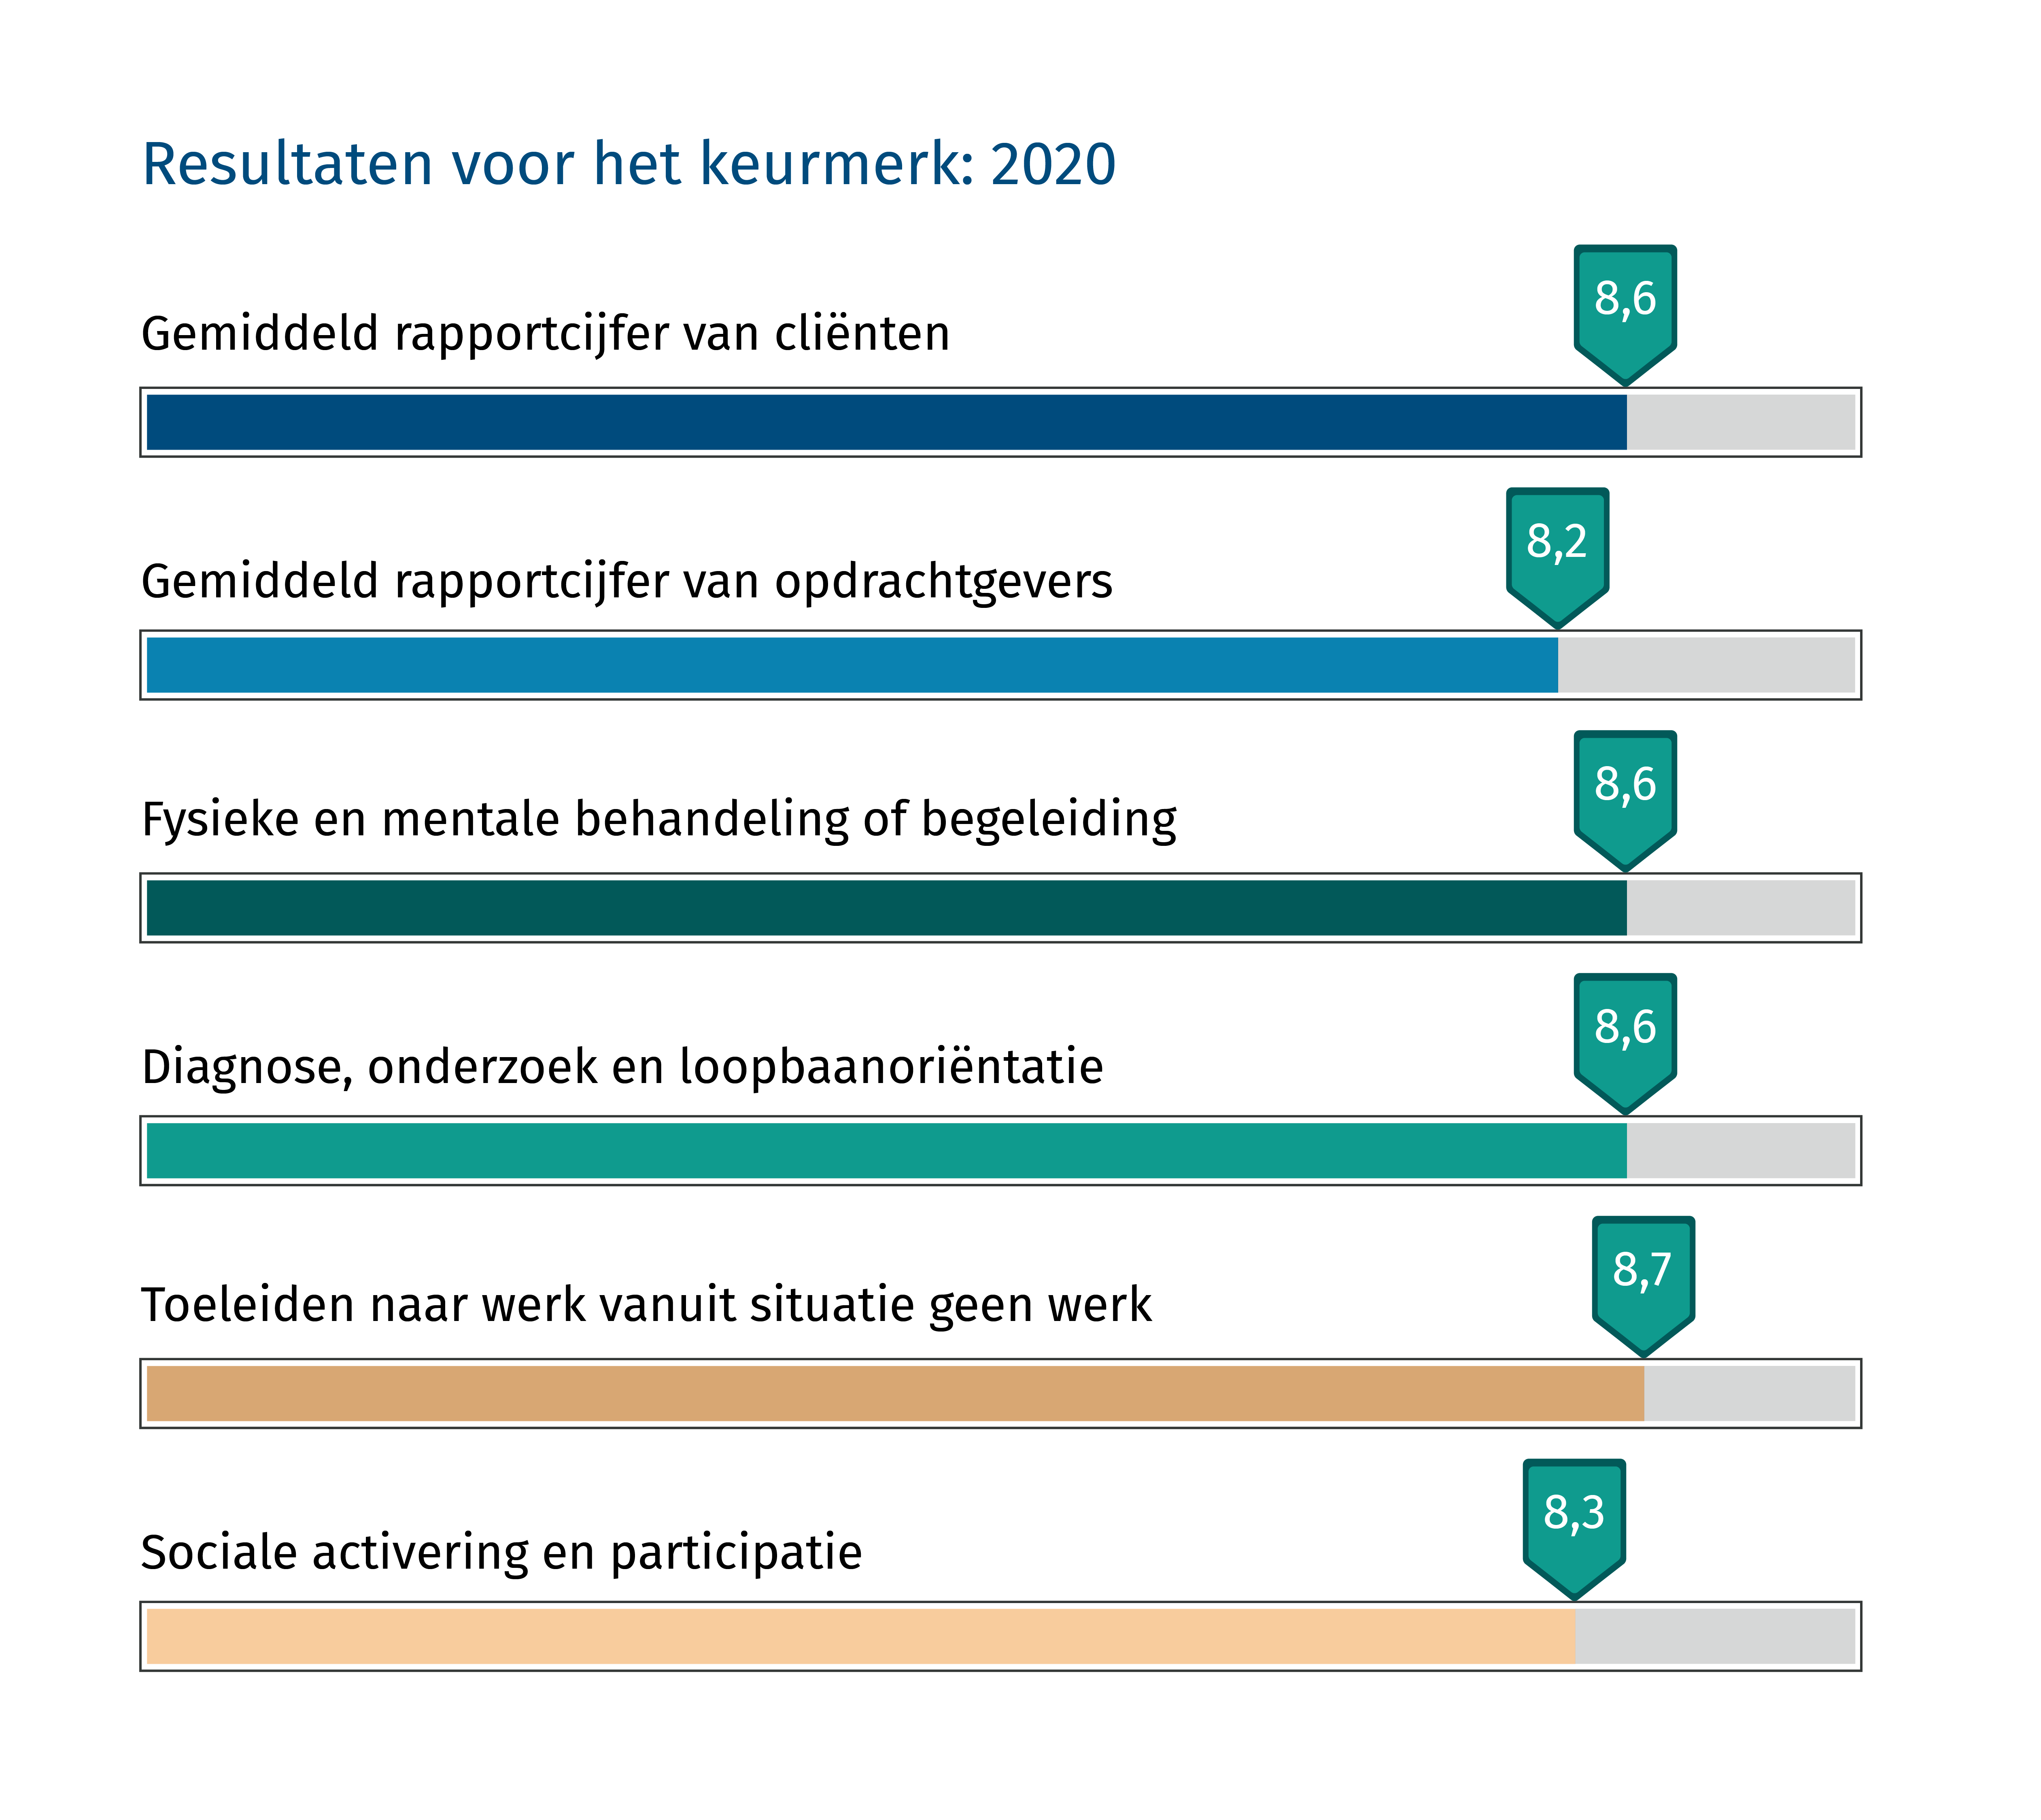 Resultaten 2020